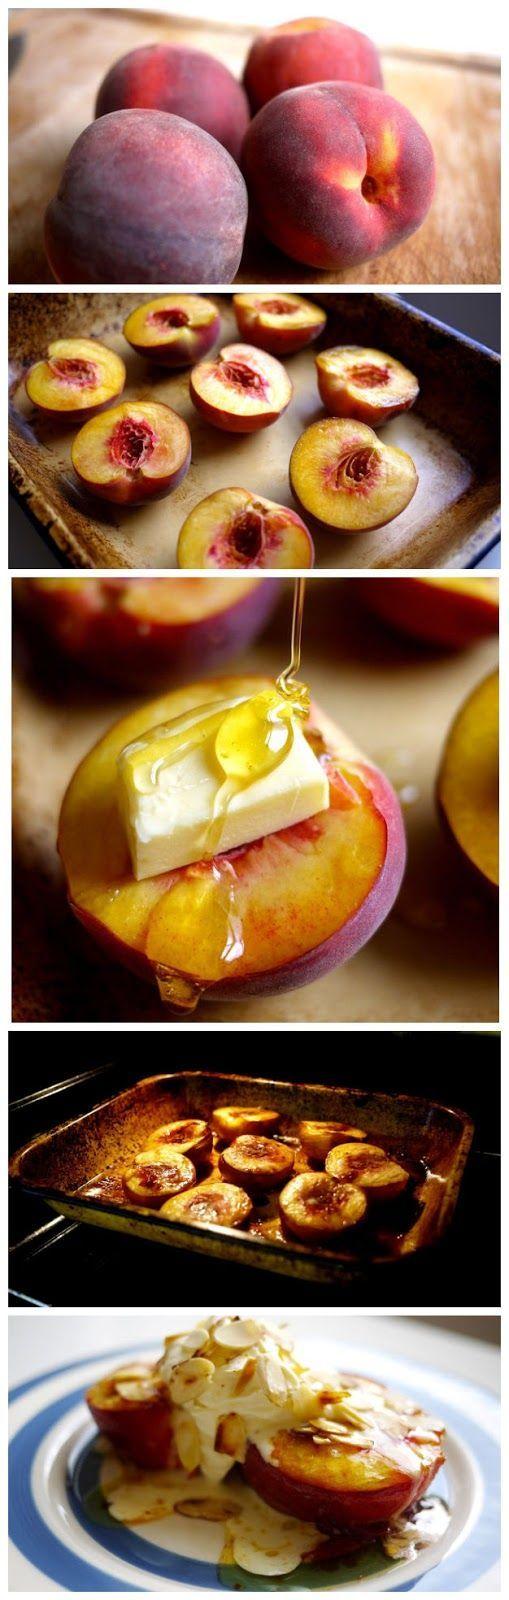 Honey Roast Peaches with sliced almonds